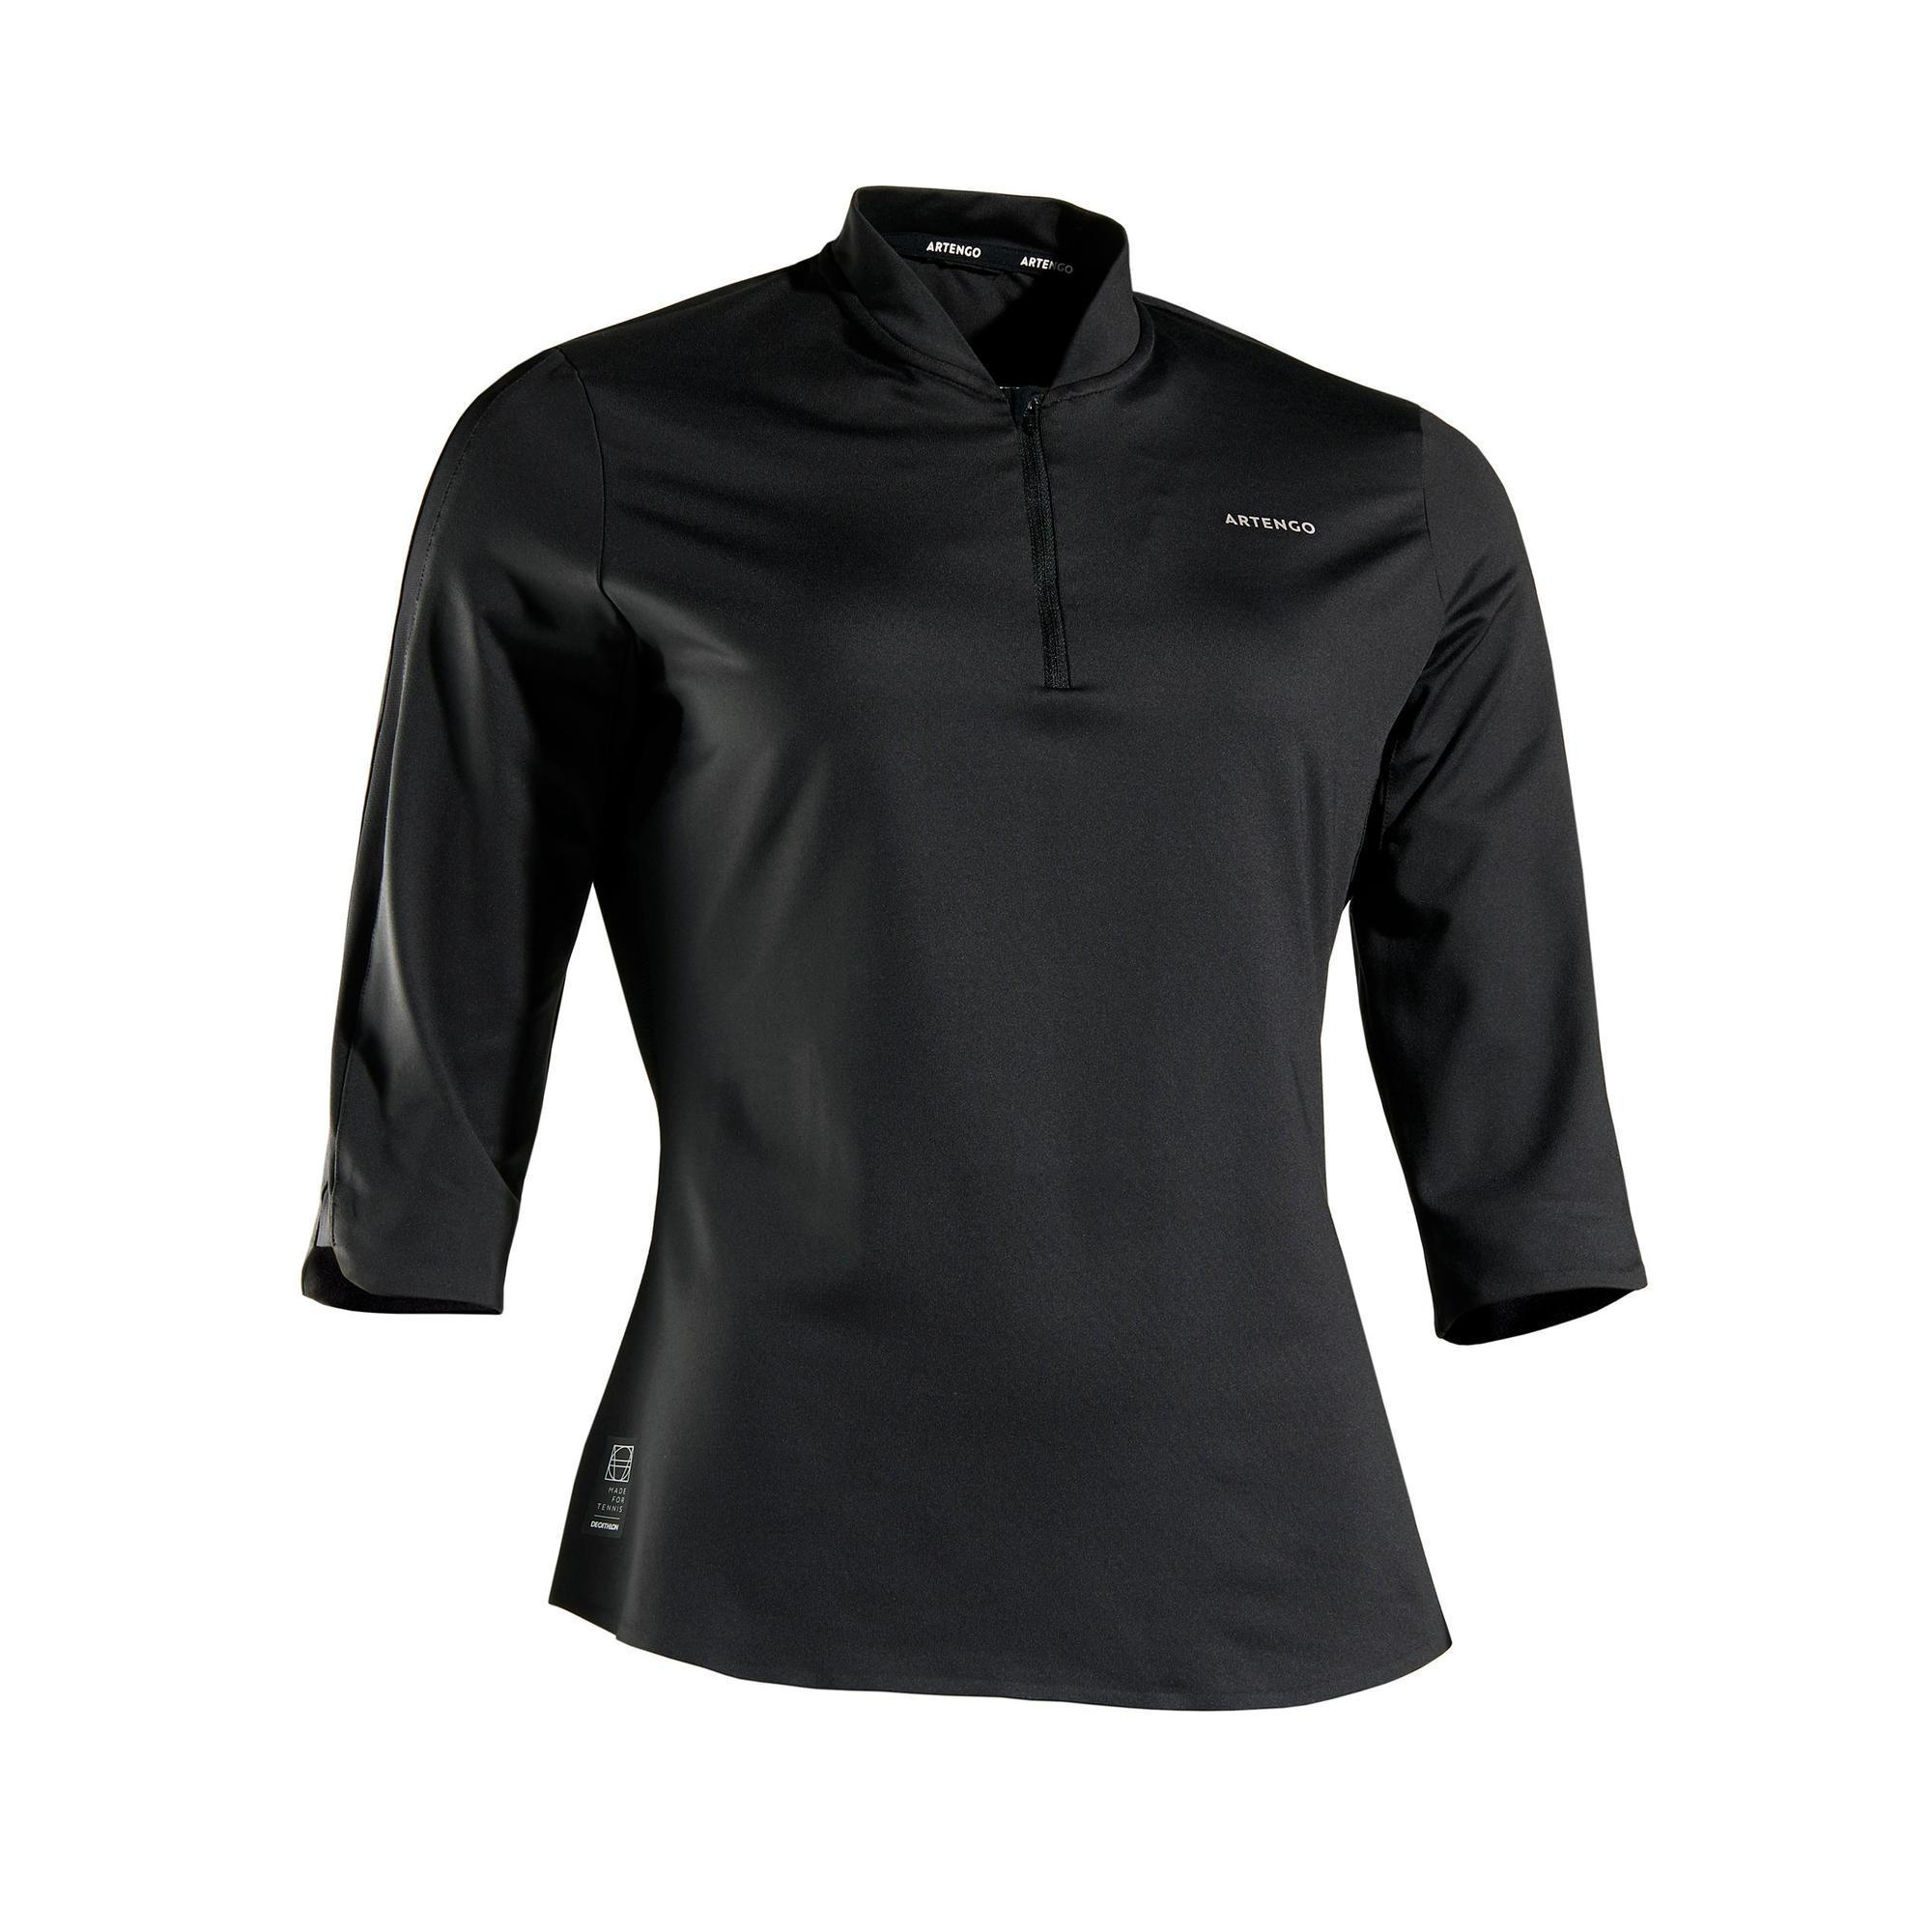 Tennistop TS Dry 900 3/4-Ärmel Damen | Sportbekleidung > Sporttops > Tennistops | Artengo